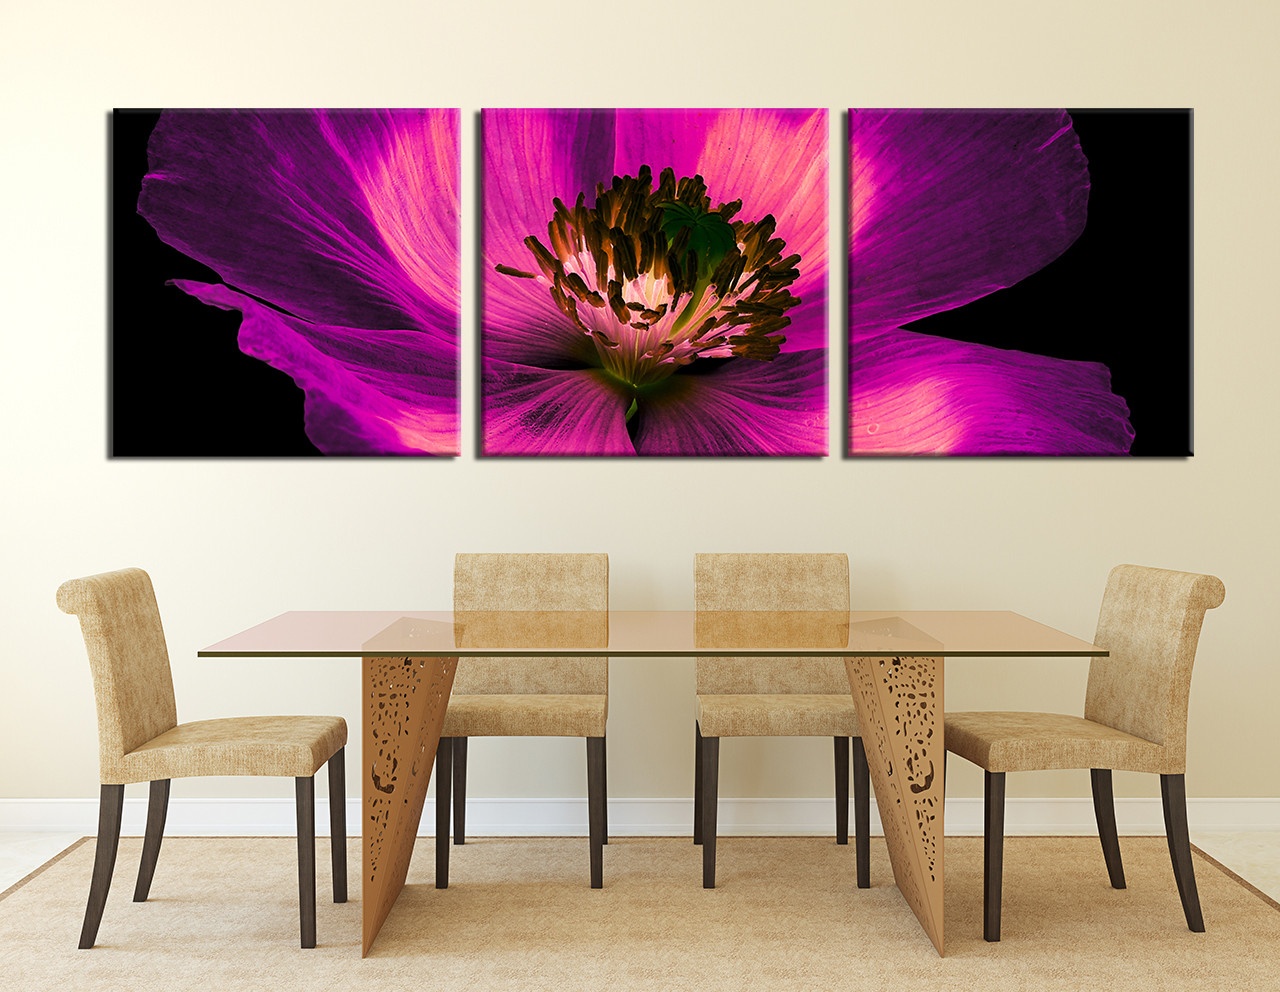 Floral Canvas Wall Art 3 piece group canvas, purple flowers multi panel art, floral